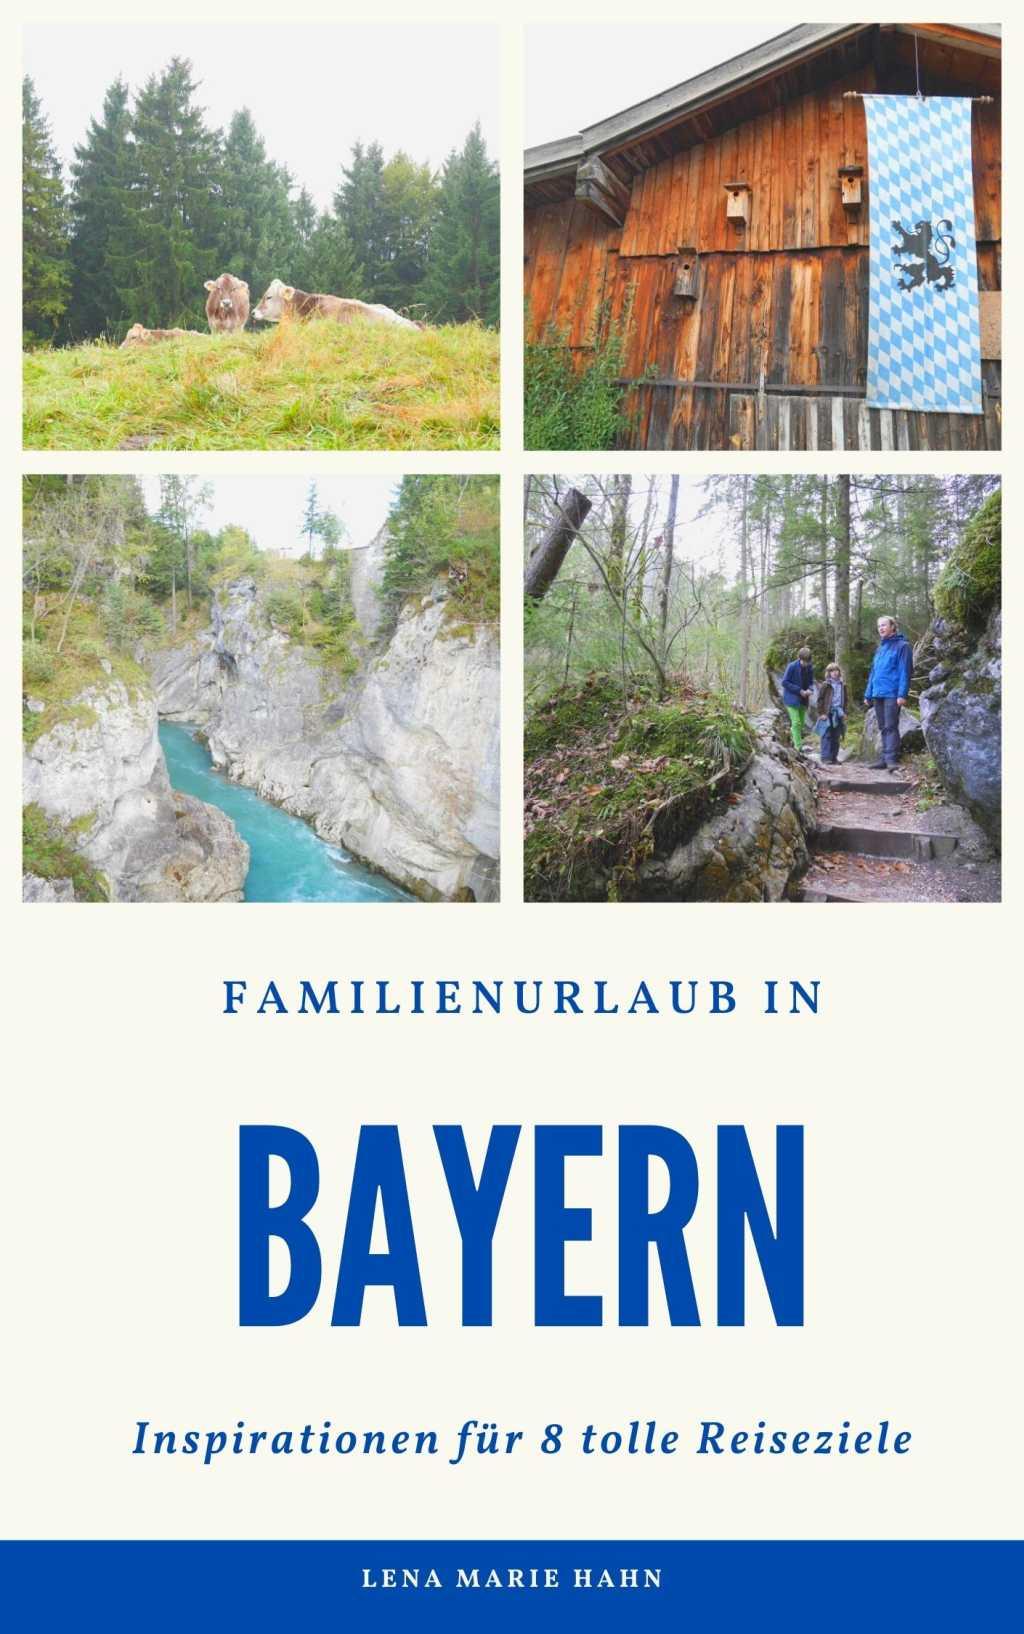 familienurlaub in bayern ebook cover